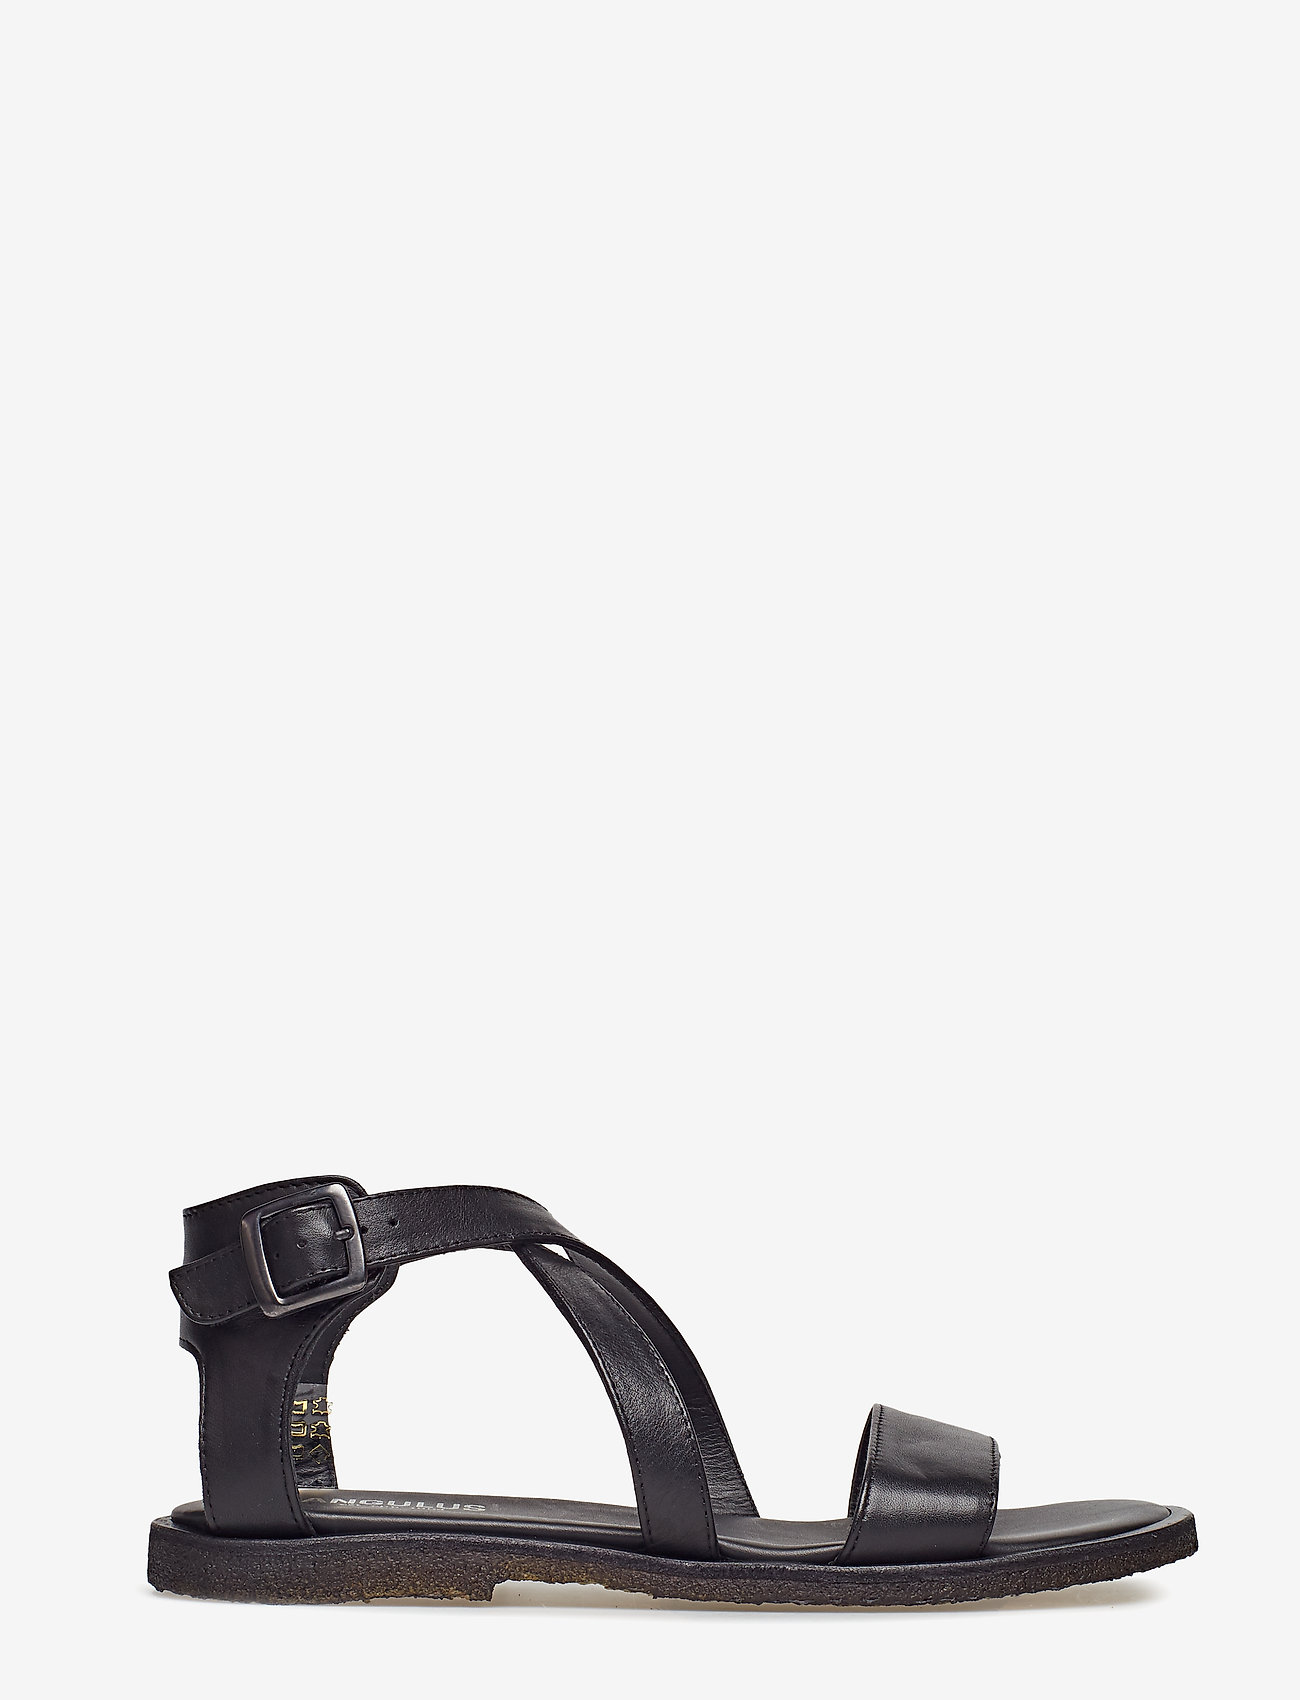 ANGULUS - 5442 - platta sandaler - 1604 black - 1